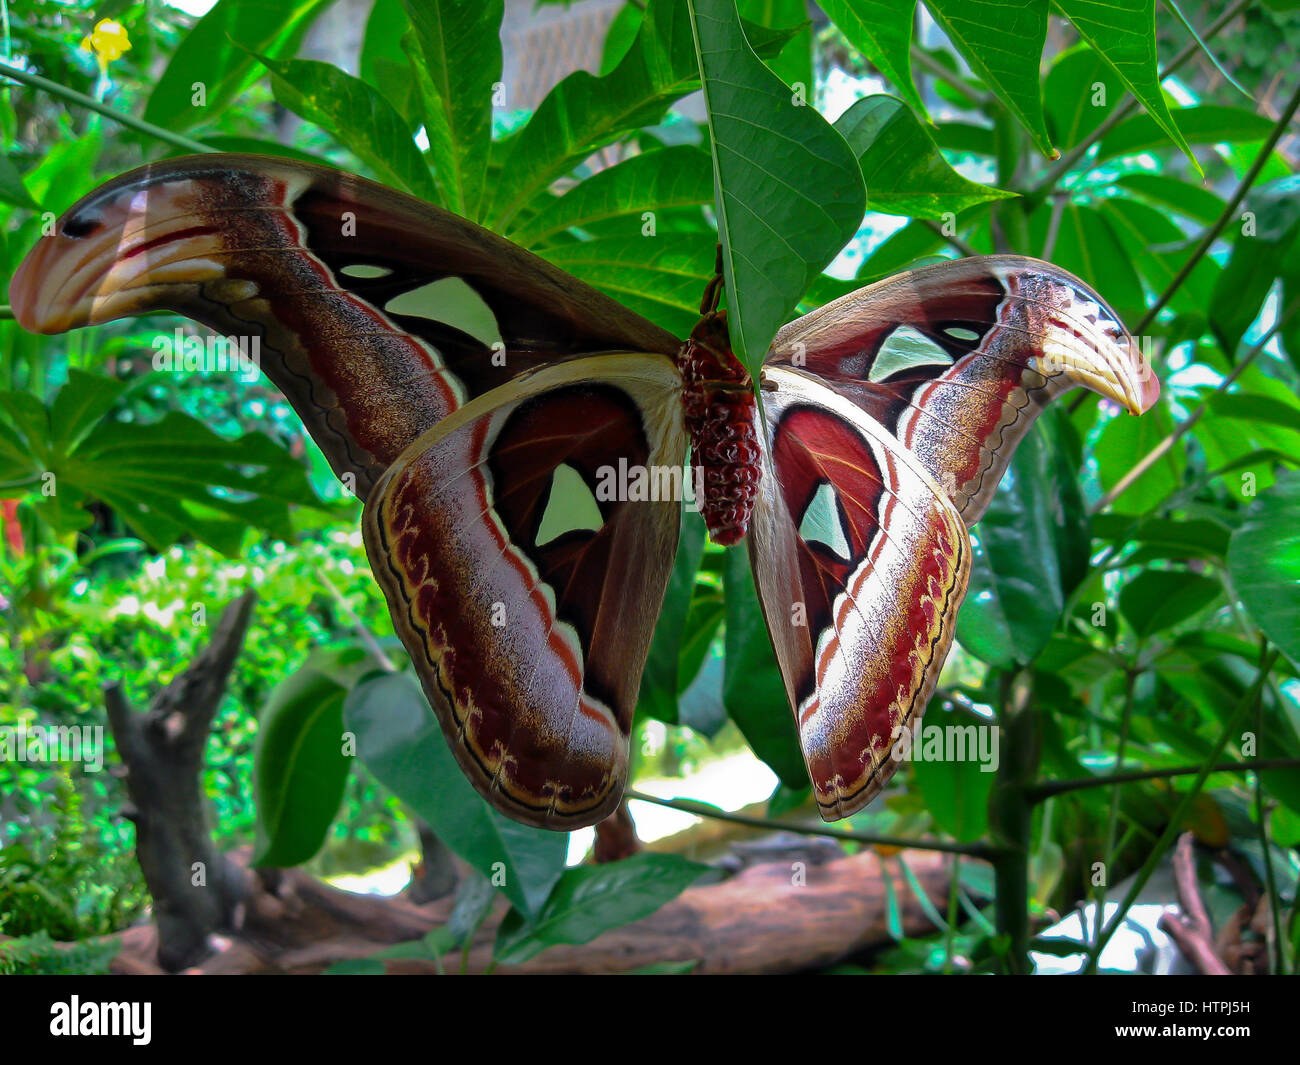 Kingdom:Animalia Phylum:Arthropoda Class:Insecta Order:Lepidoptera Family:Saturniidae Genus:Attacus Species:A. atlas - Stock Image